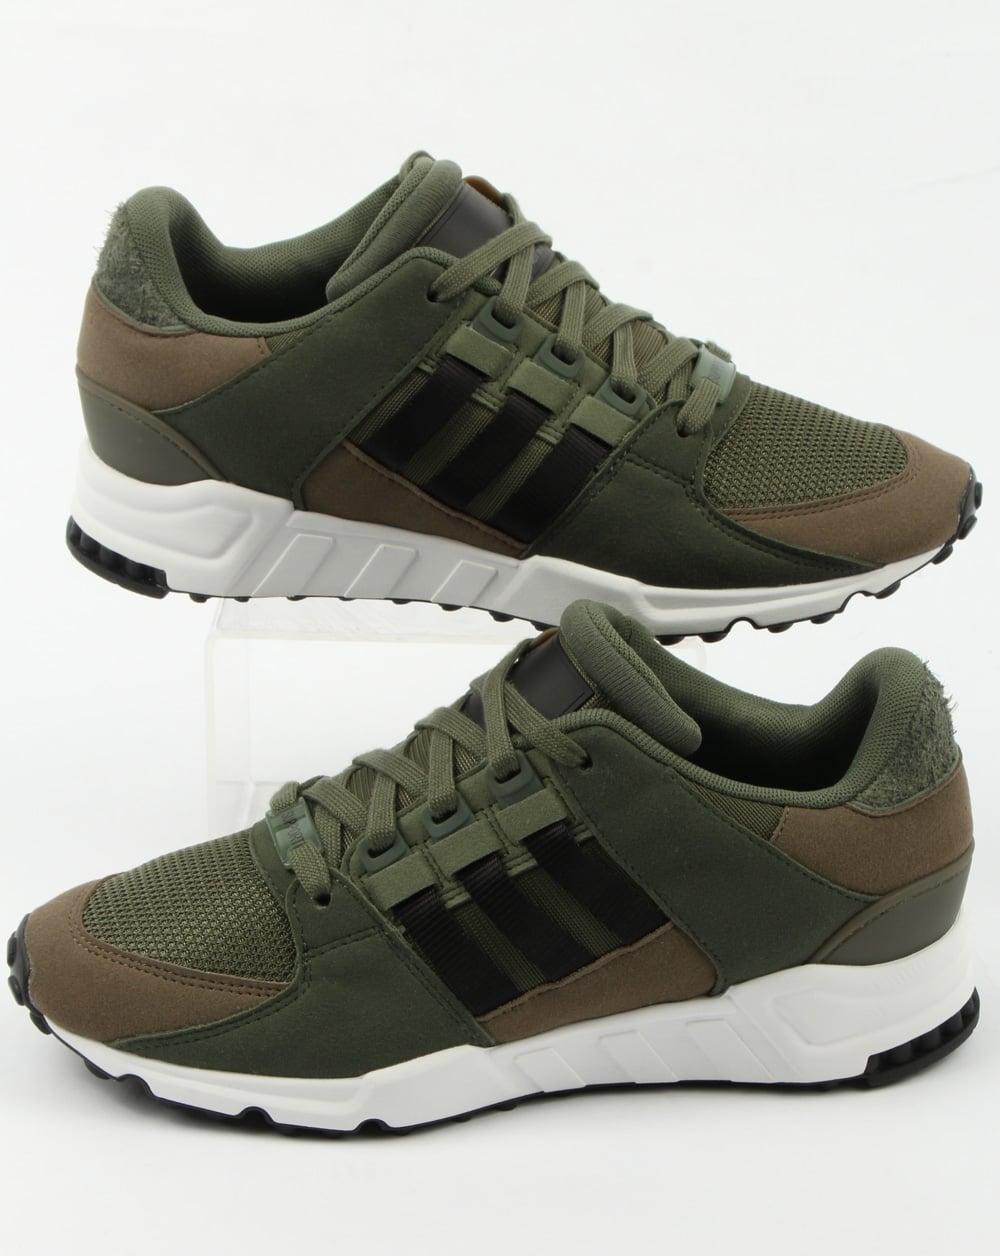 e71b4cf1e077 adidas Trainers Adidas EQT Support RF Trainers St Major black branch